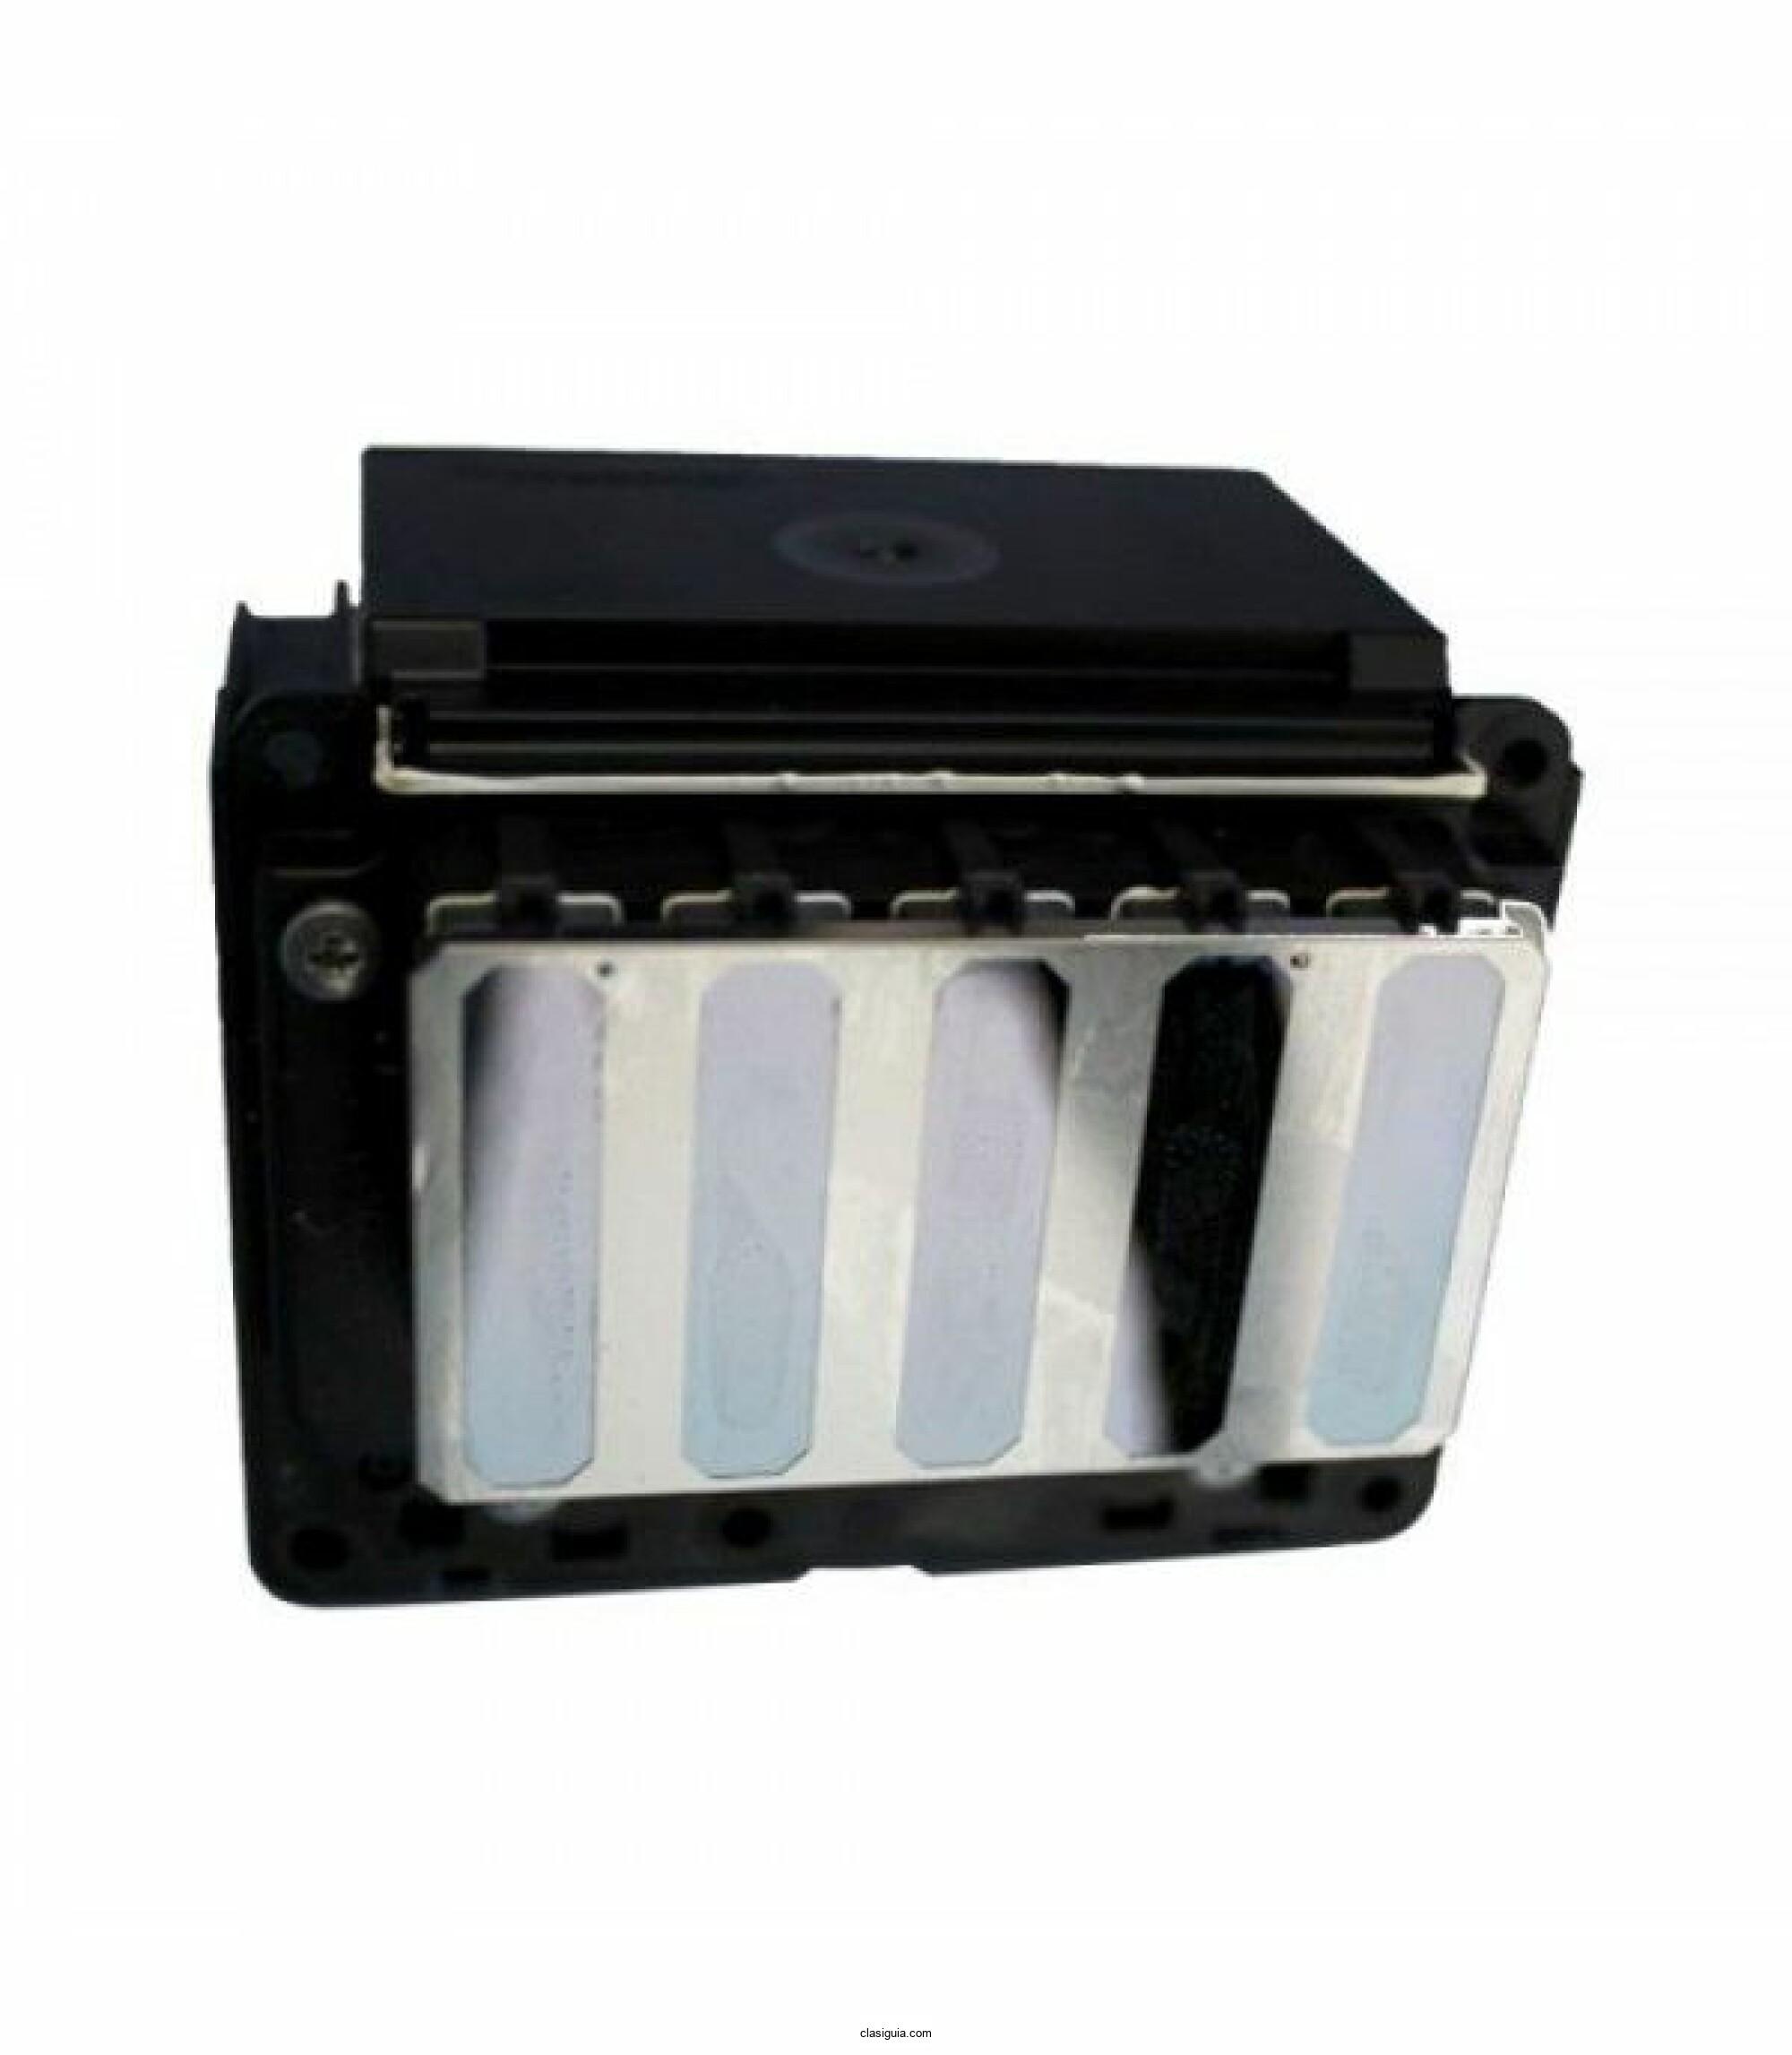 Epson R4900 / R4910 / SPE4910 Printhead - F198000 / F198060 (ASOKA PRINTING)